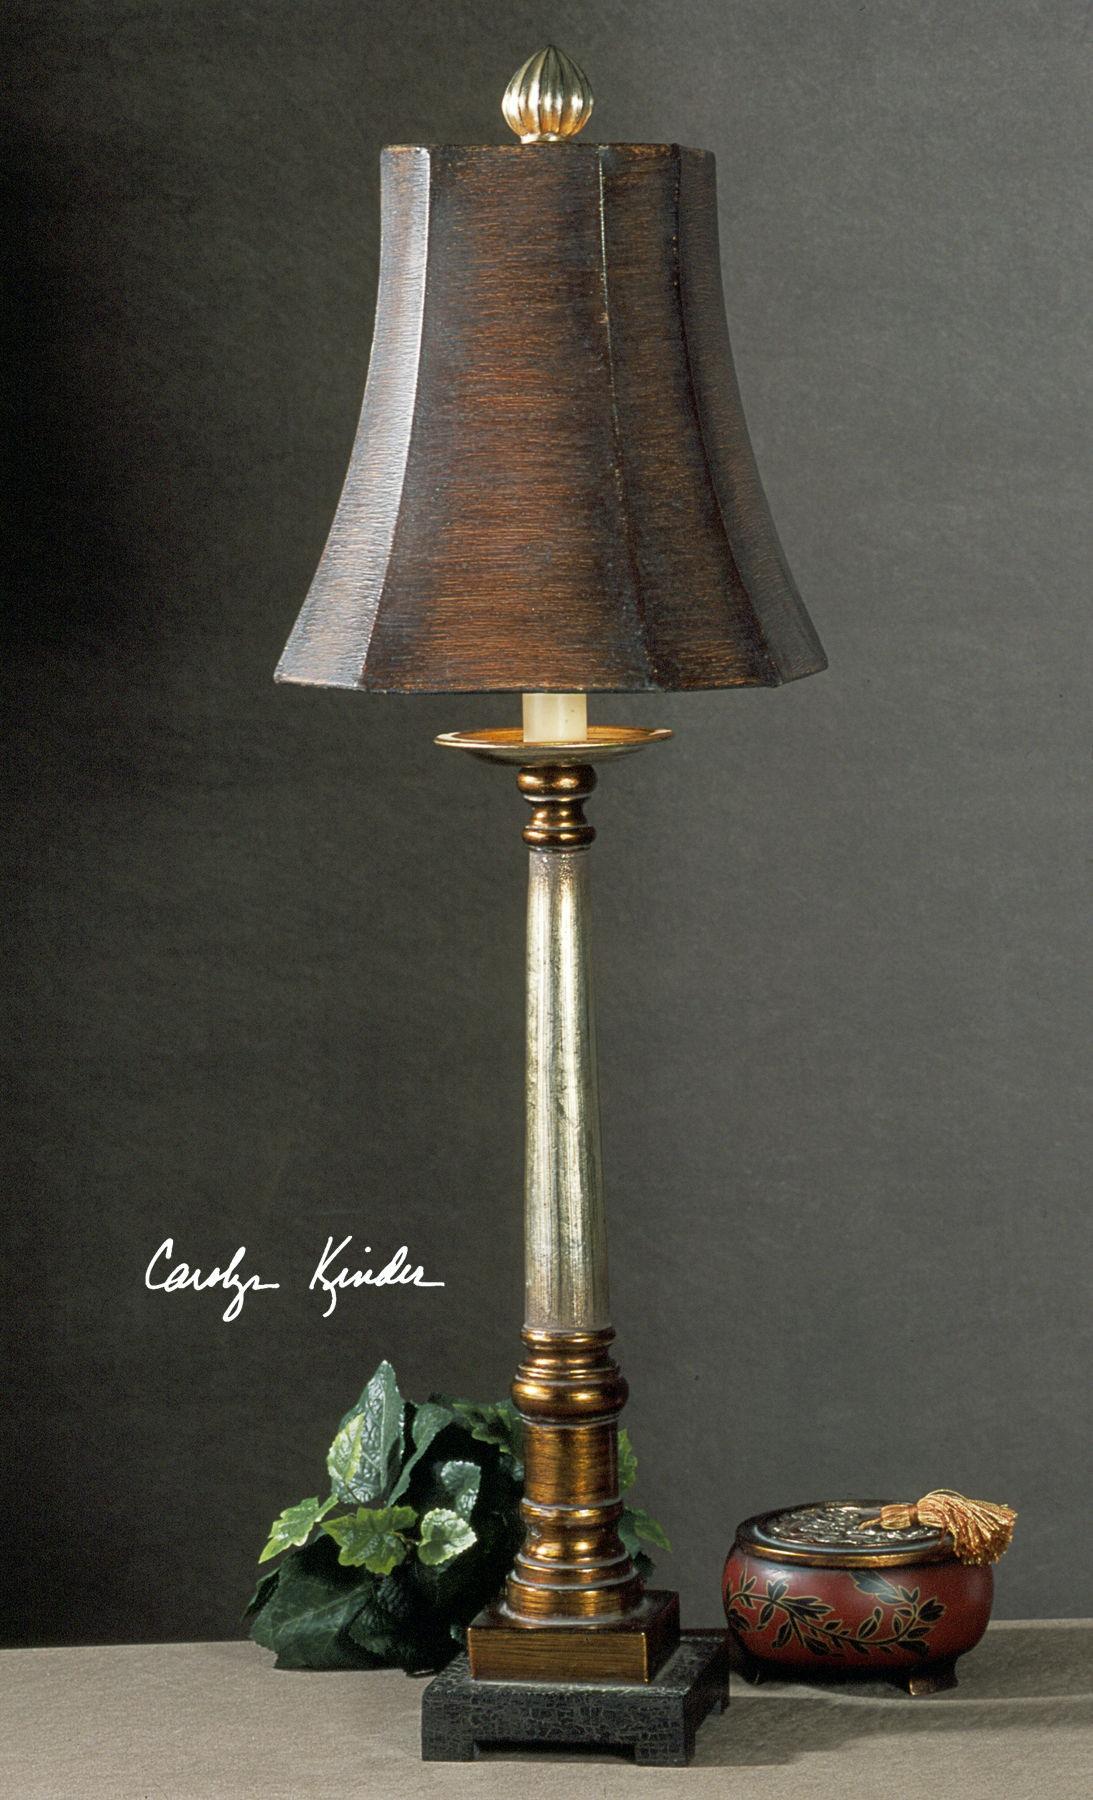 uttermost buffet lamps silver uttermost trent buffet lamp 29058 lamps and lighting lenoir empire